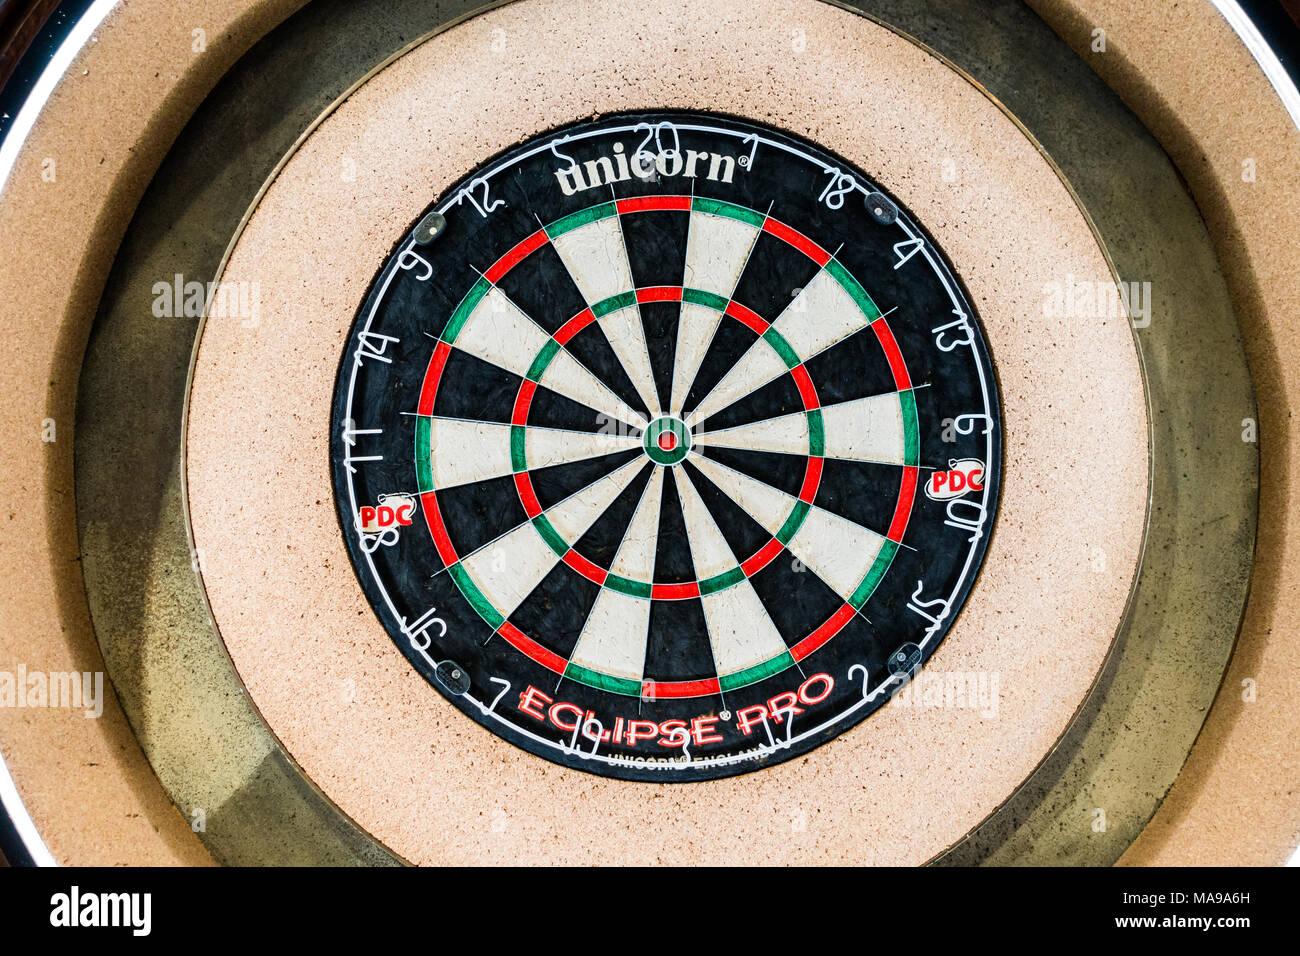 Dart Boards Stock Photos & Dart Boards Stock Images - Alamy